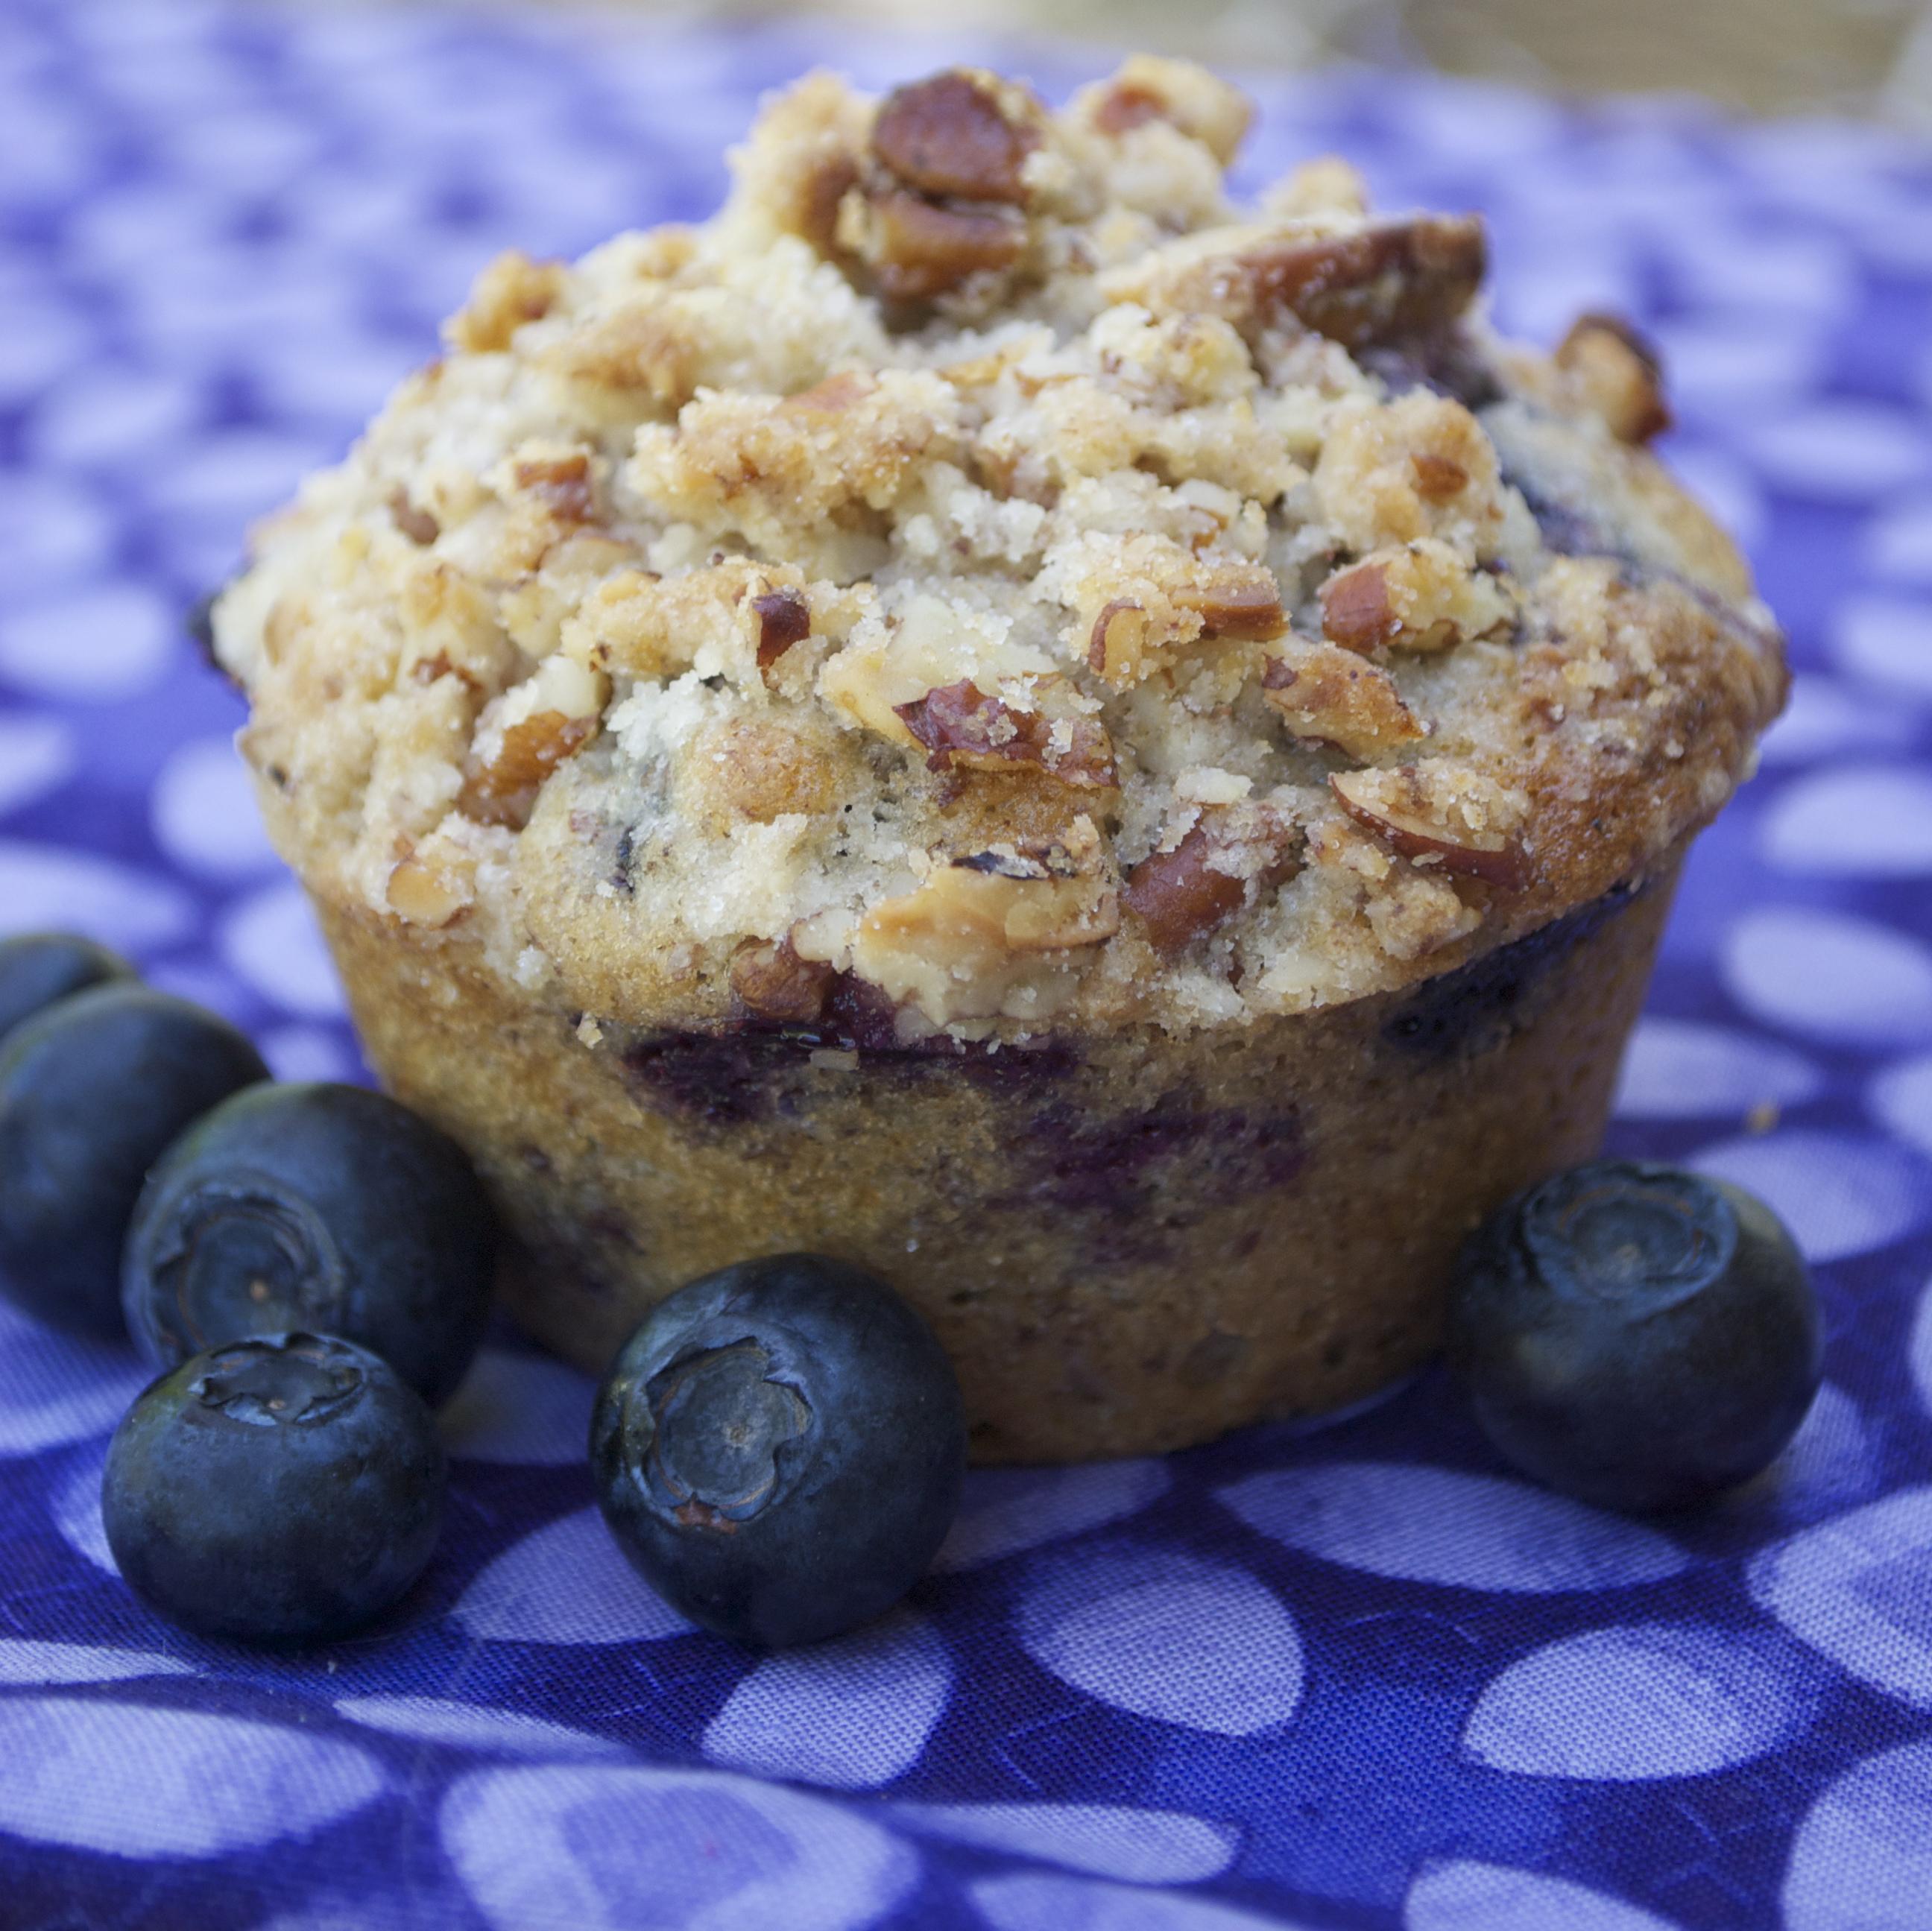 Blueberry Streusel Muffins - Mama's Gotta Bake